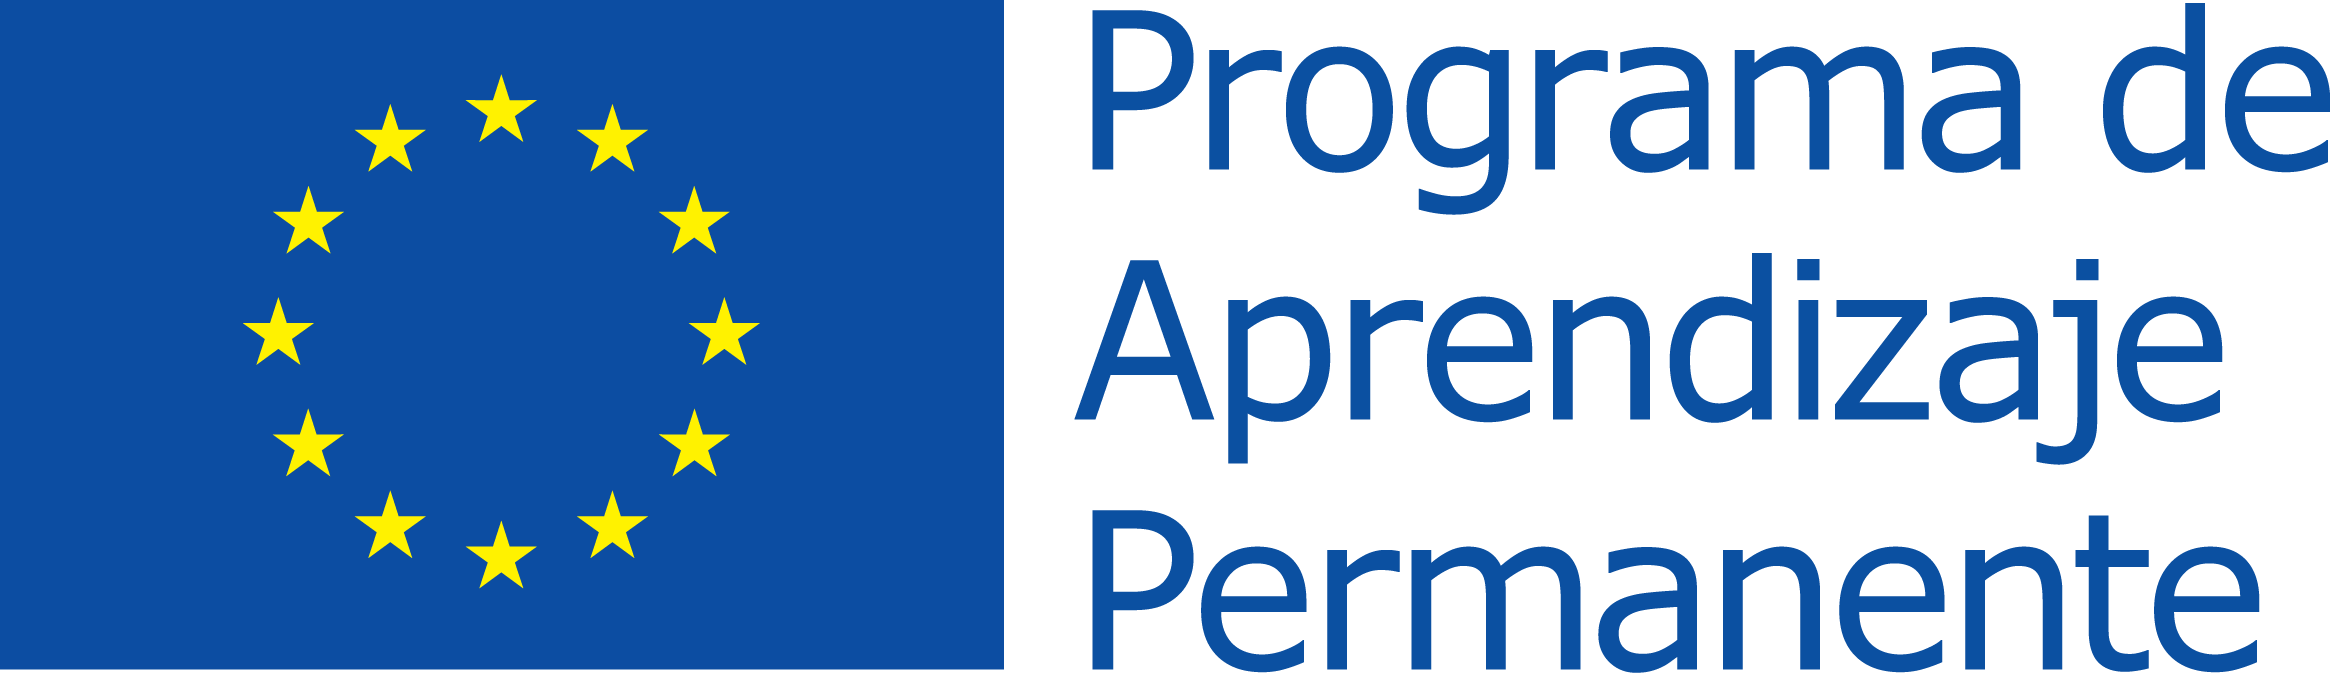 Programa Aprendizaje Permanente UE